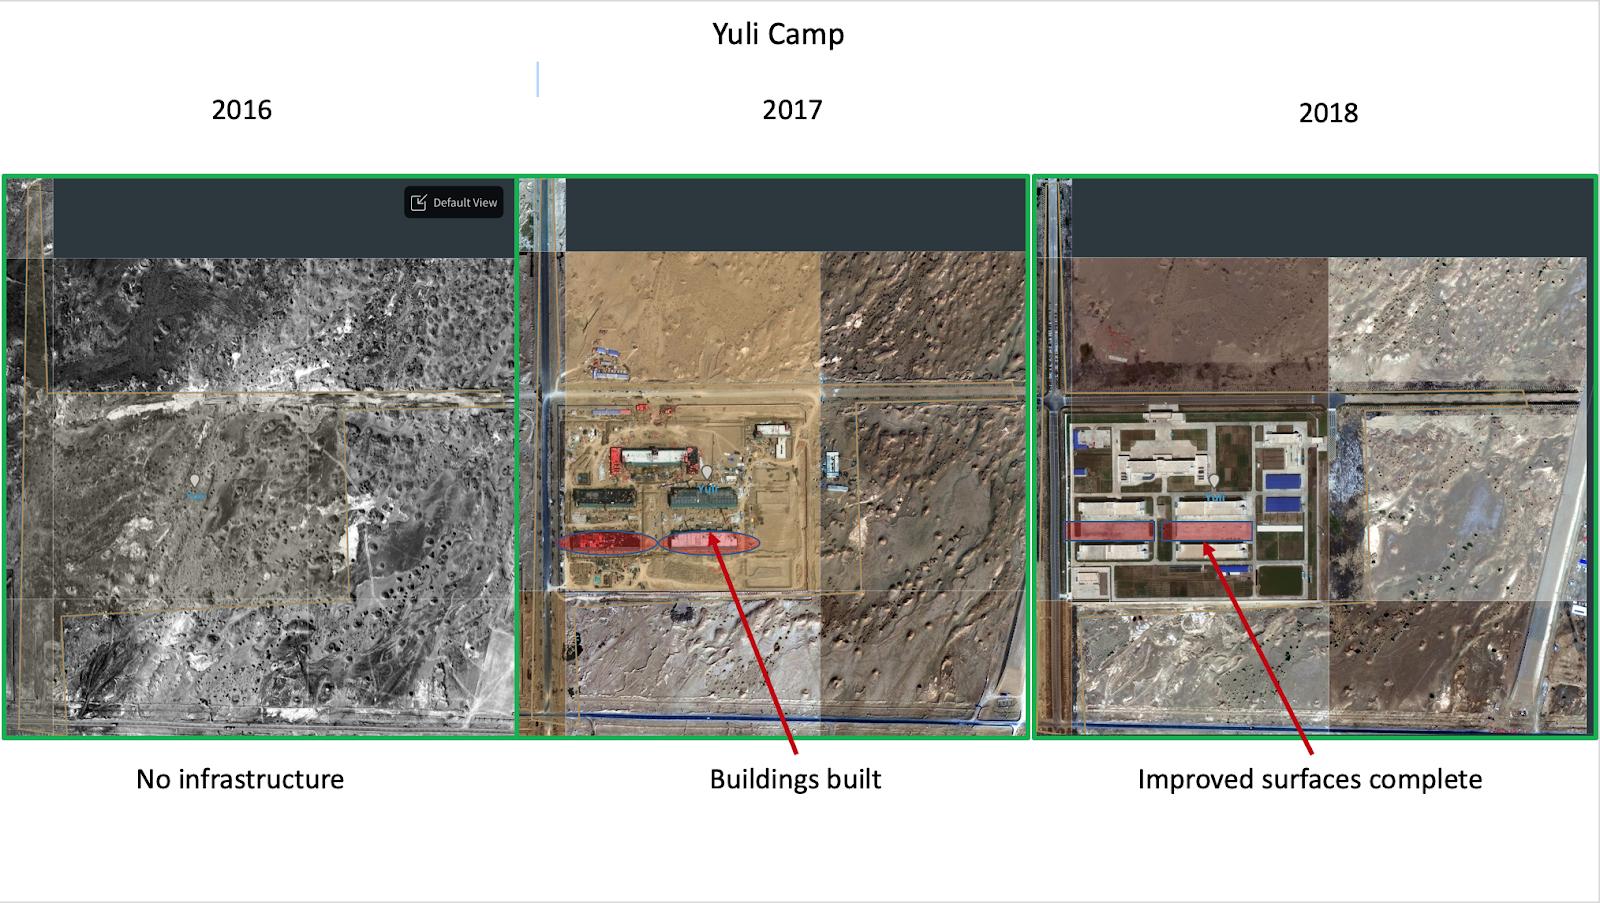 Yuli re-education camp